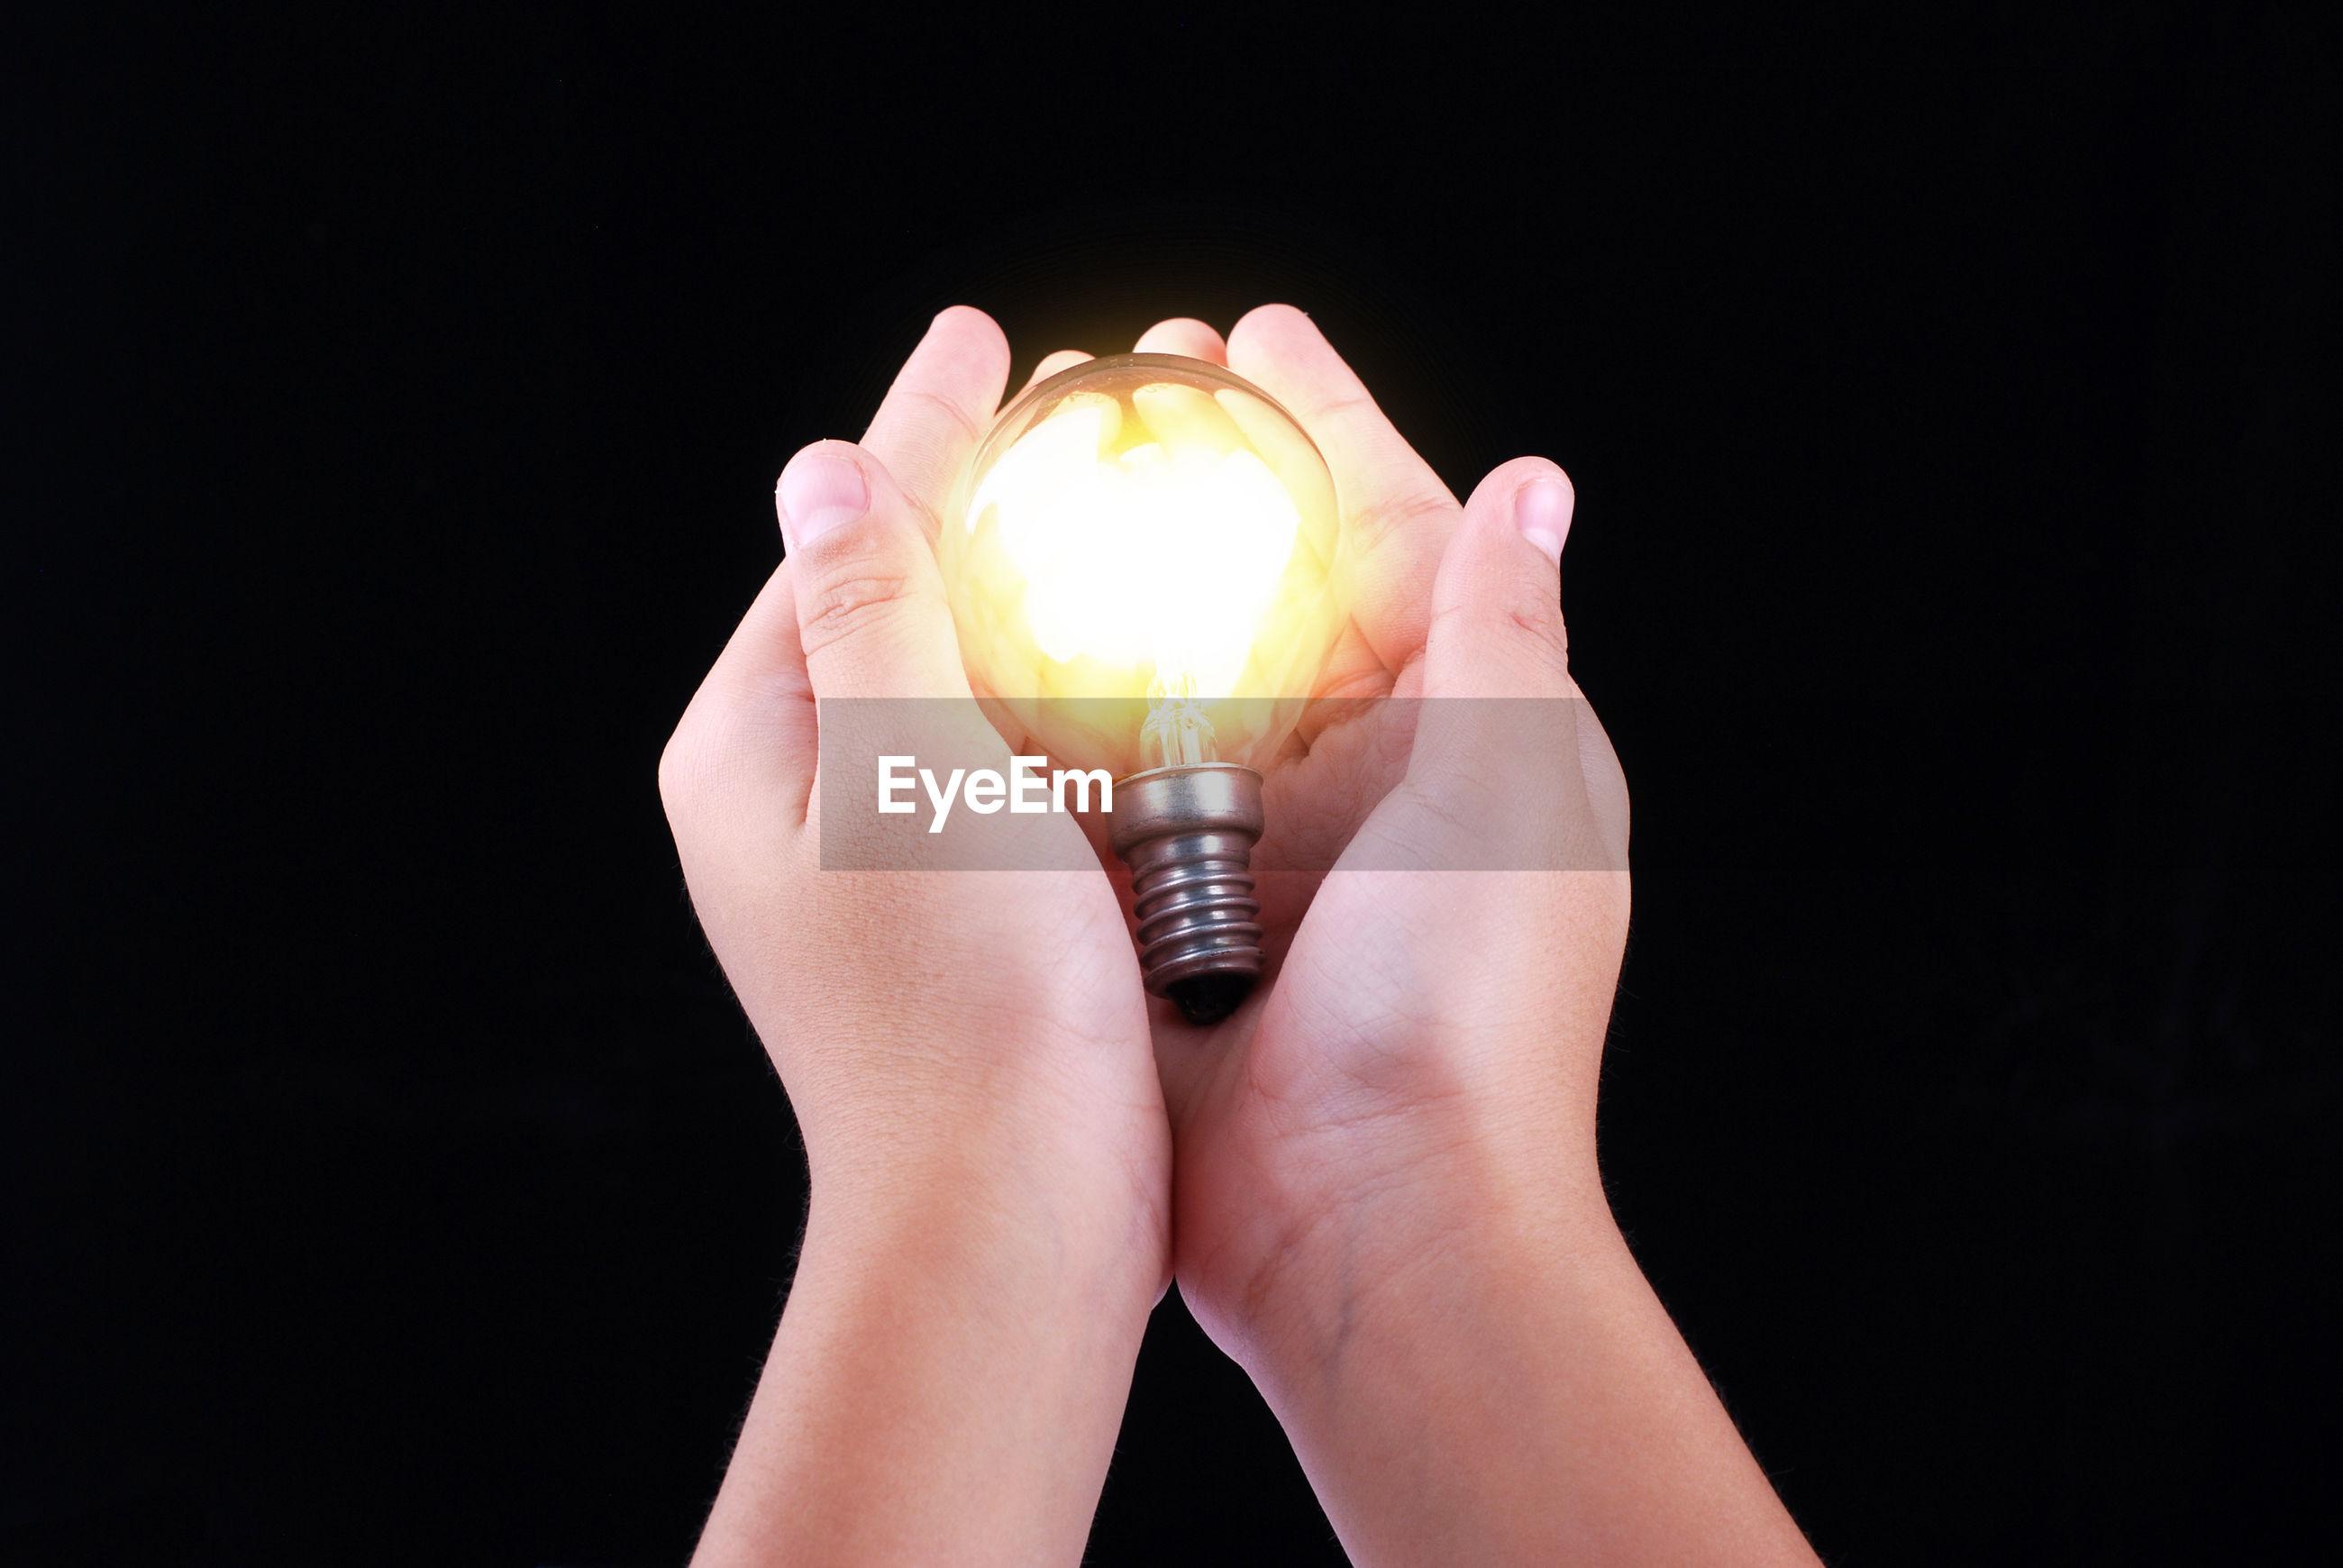 Close-up of hand holding illuminated light bulb against black background